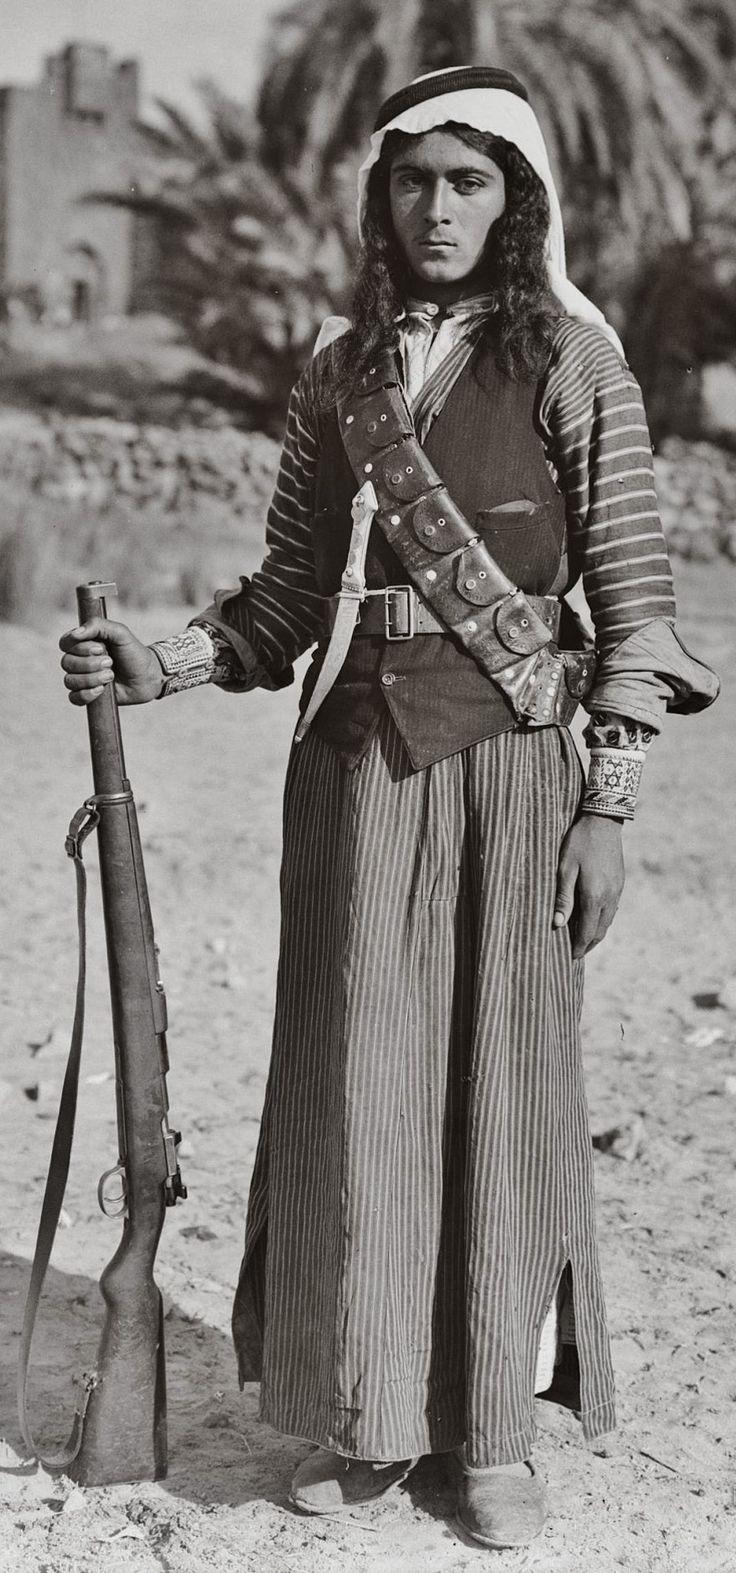 Bedouin warrior - Egypt, early 20th century.